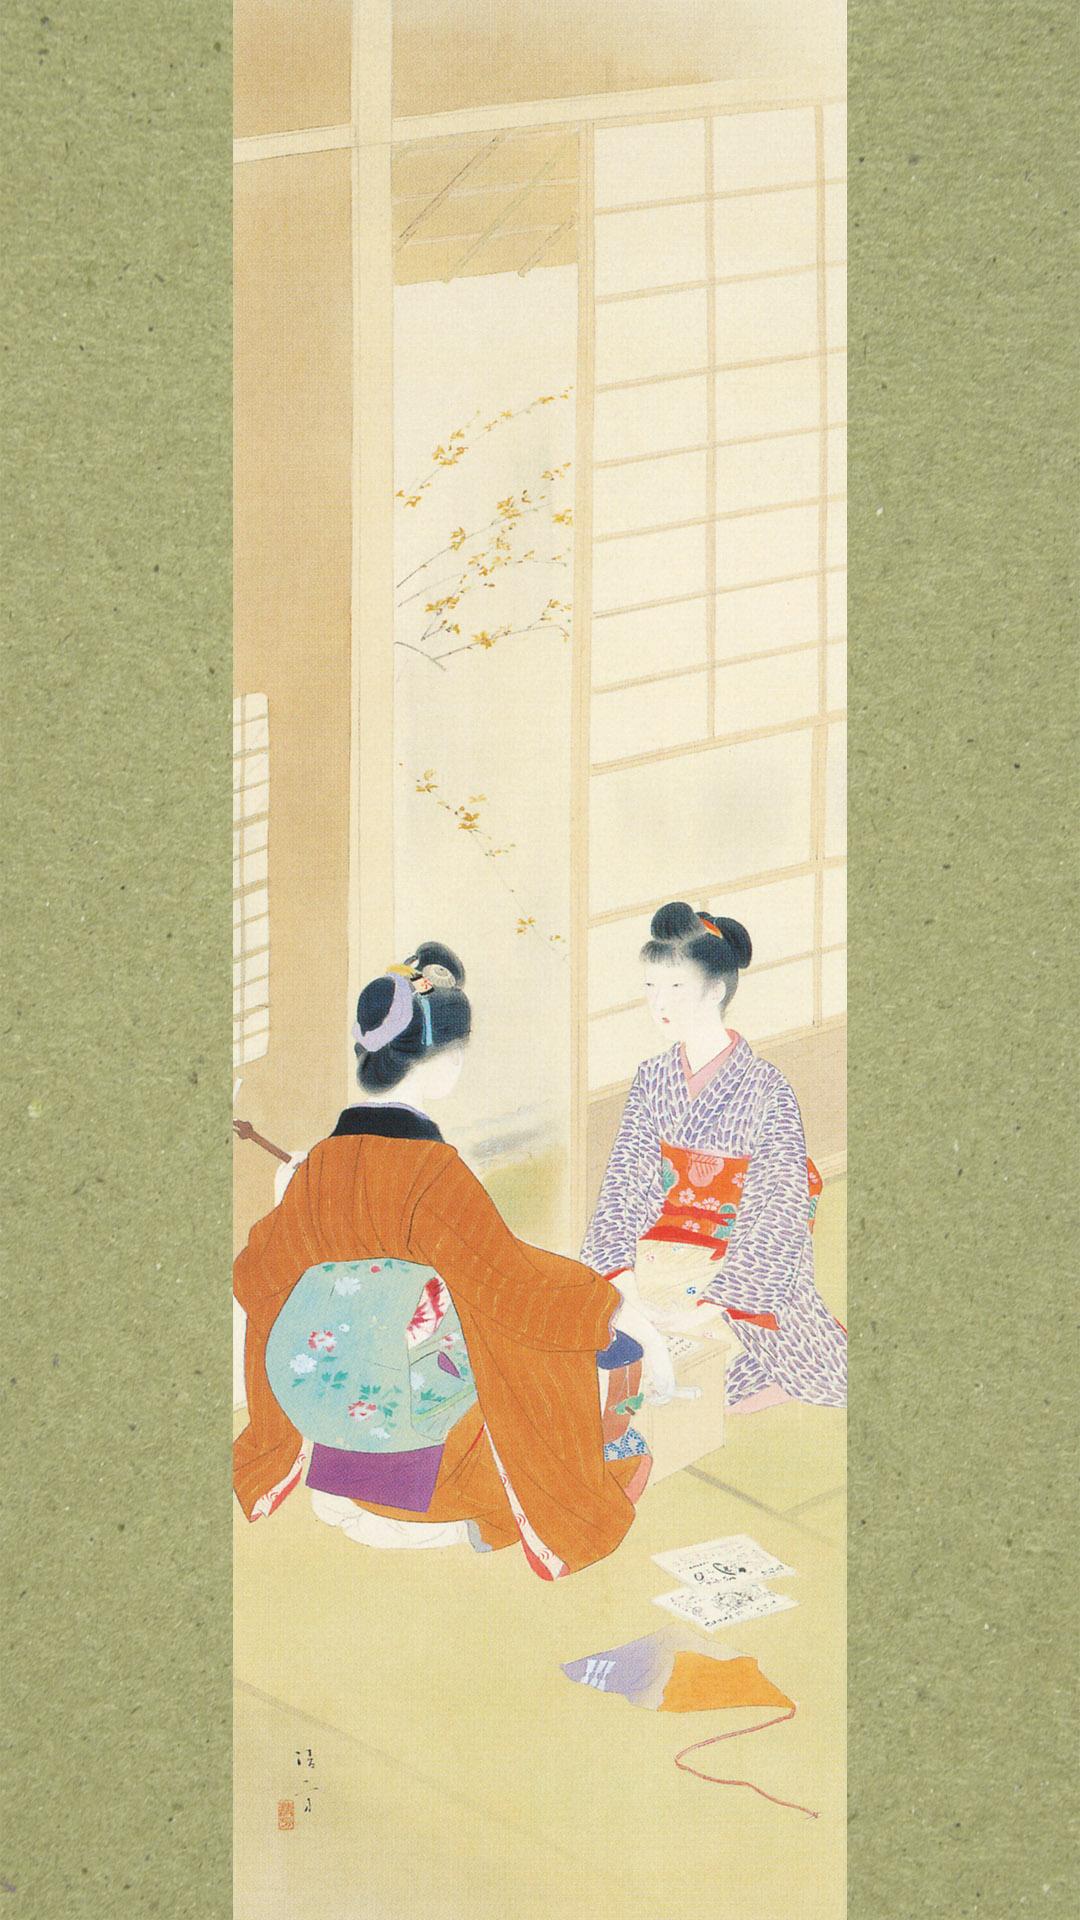 Kaburaki Kiyokata - Meiji 12 fuzoku 03 Keiko 1080x1920 2